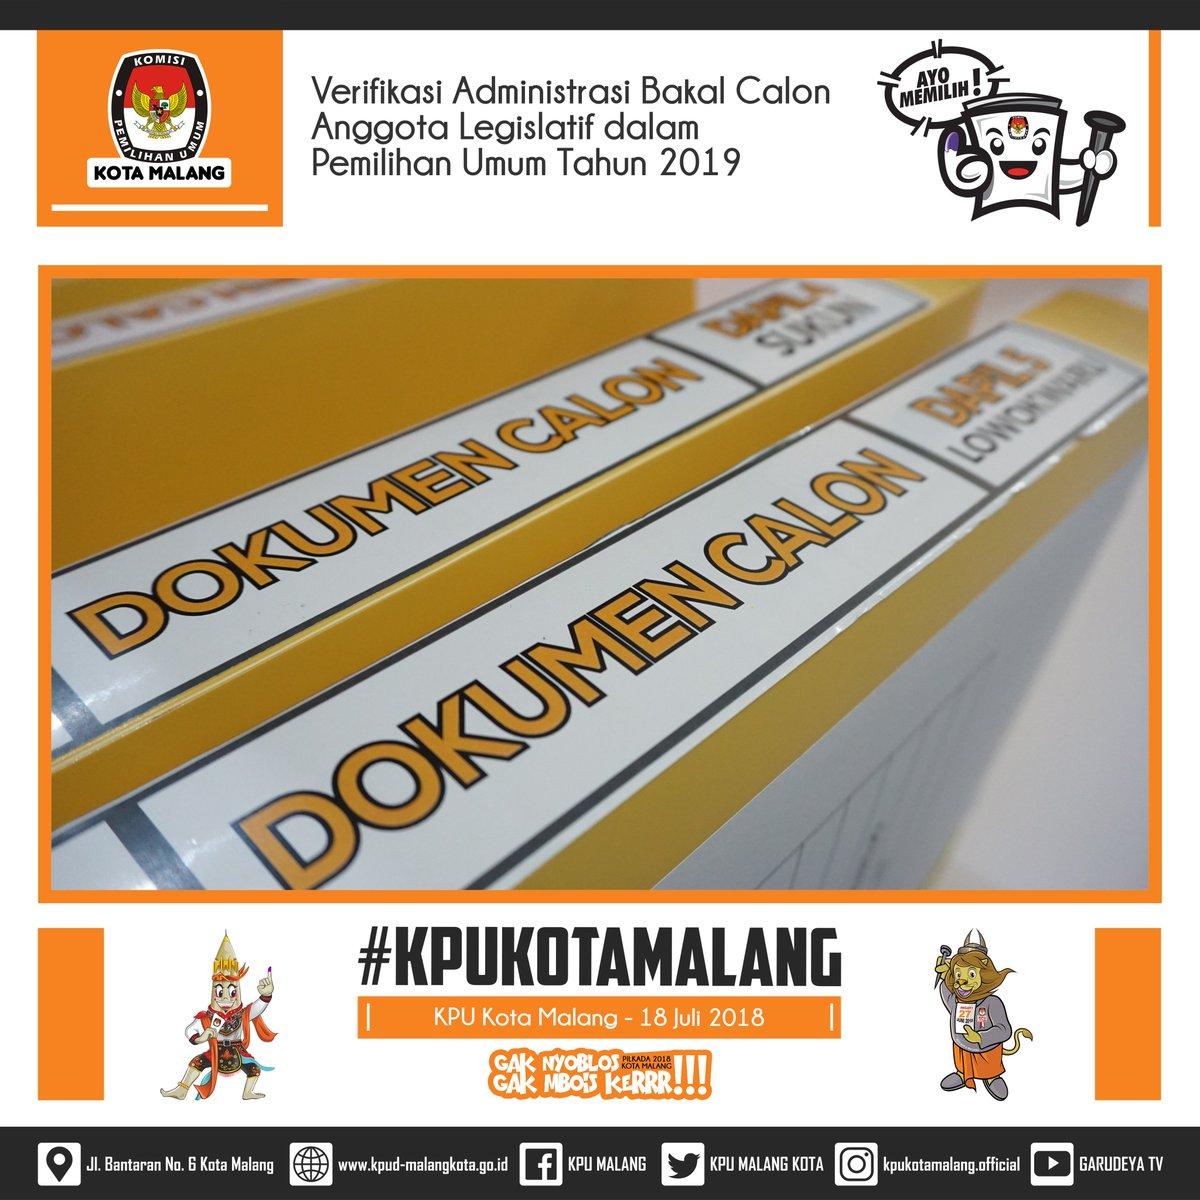 Verifikasi Administrasi Bakal Calon Anggota DRPD Kota Malang dalam Pemilihan Umum Tahun 2019 . Rabu, 18 Juli 2018 . #KPUMELAYANI #KPURI #KPUPROVINSIJAWATIMUR #KPUKOTAMALANG #Pemilu2019 #PemilihBerdaulatNegaraKuat #PilgubJatim2018 #PilgubJatimGuyubRukun #PilkadaKotaMalang2018